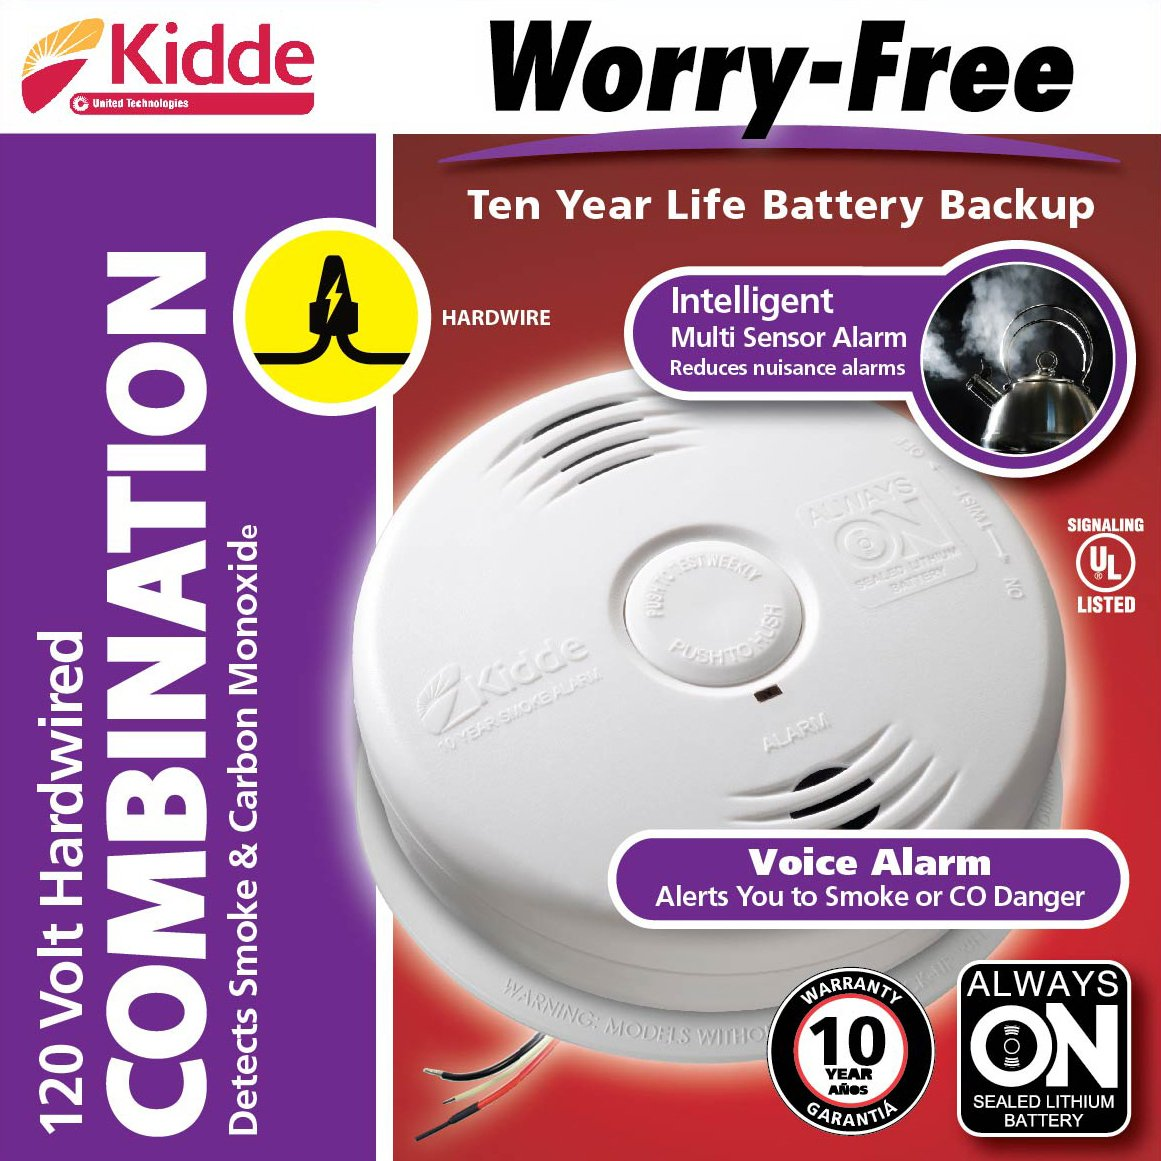 Worry-Free Hardwired Smoke & Carbon Monoxide Alarm with Lithium Battery Backup I12010SCO by Kidde (Image #6)